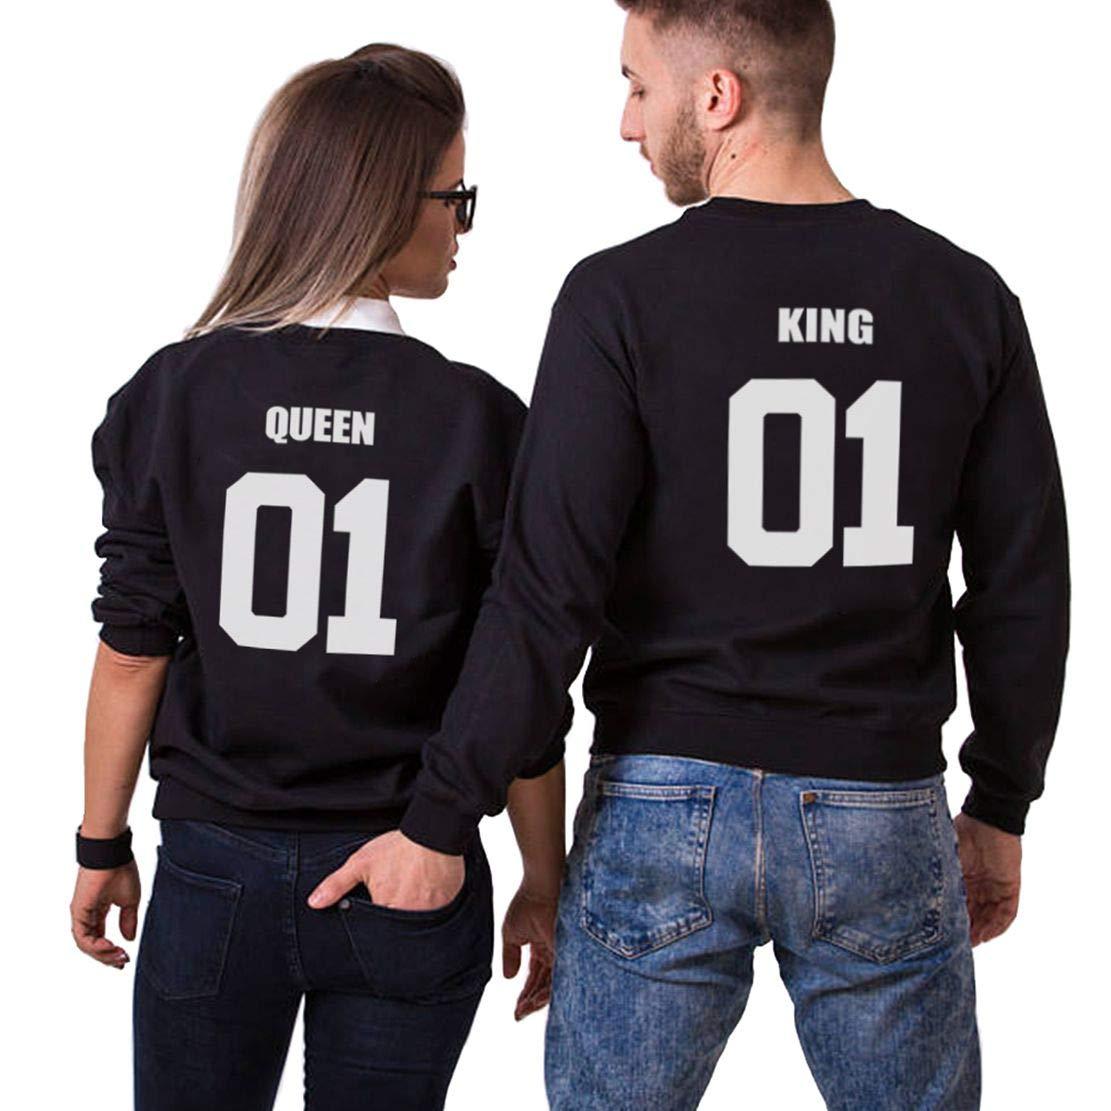 Pärchen Pullover Set King Queen Pulli Partner Sweatshirt Paare Pulli Couple Sweater Schwarz Weiß Baumwolle Damen Herbst Winter Tops Geschenk 2 Stücke